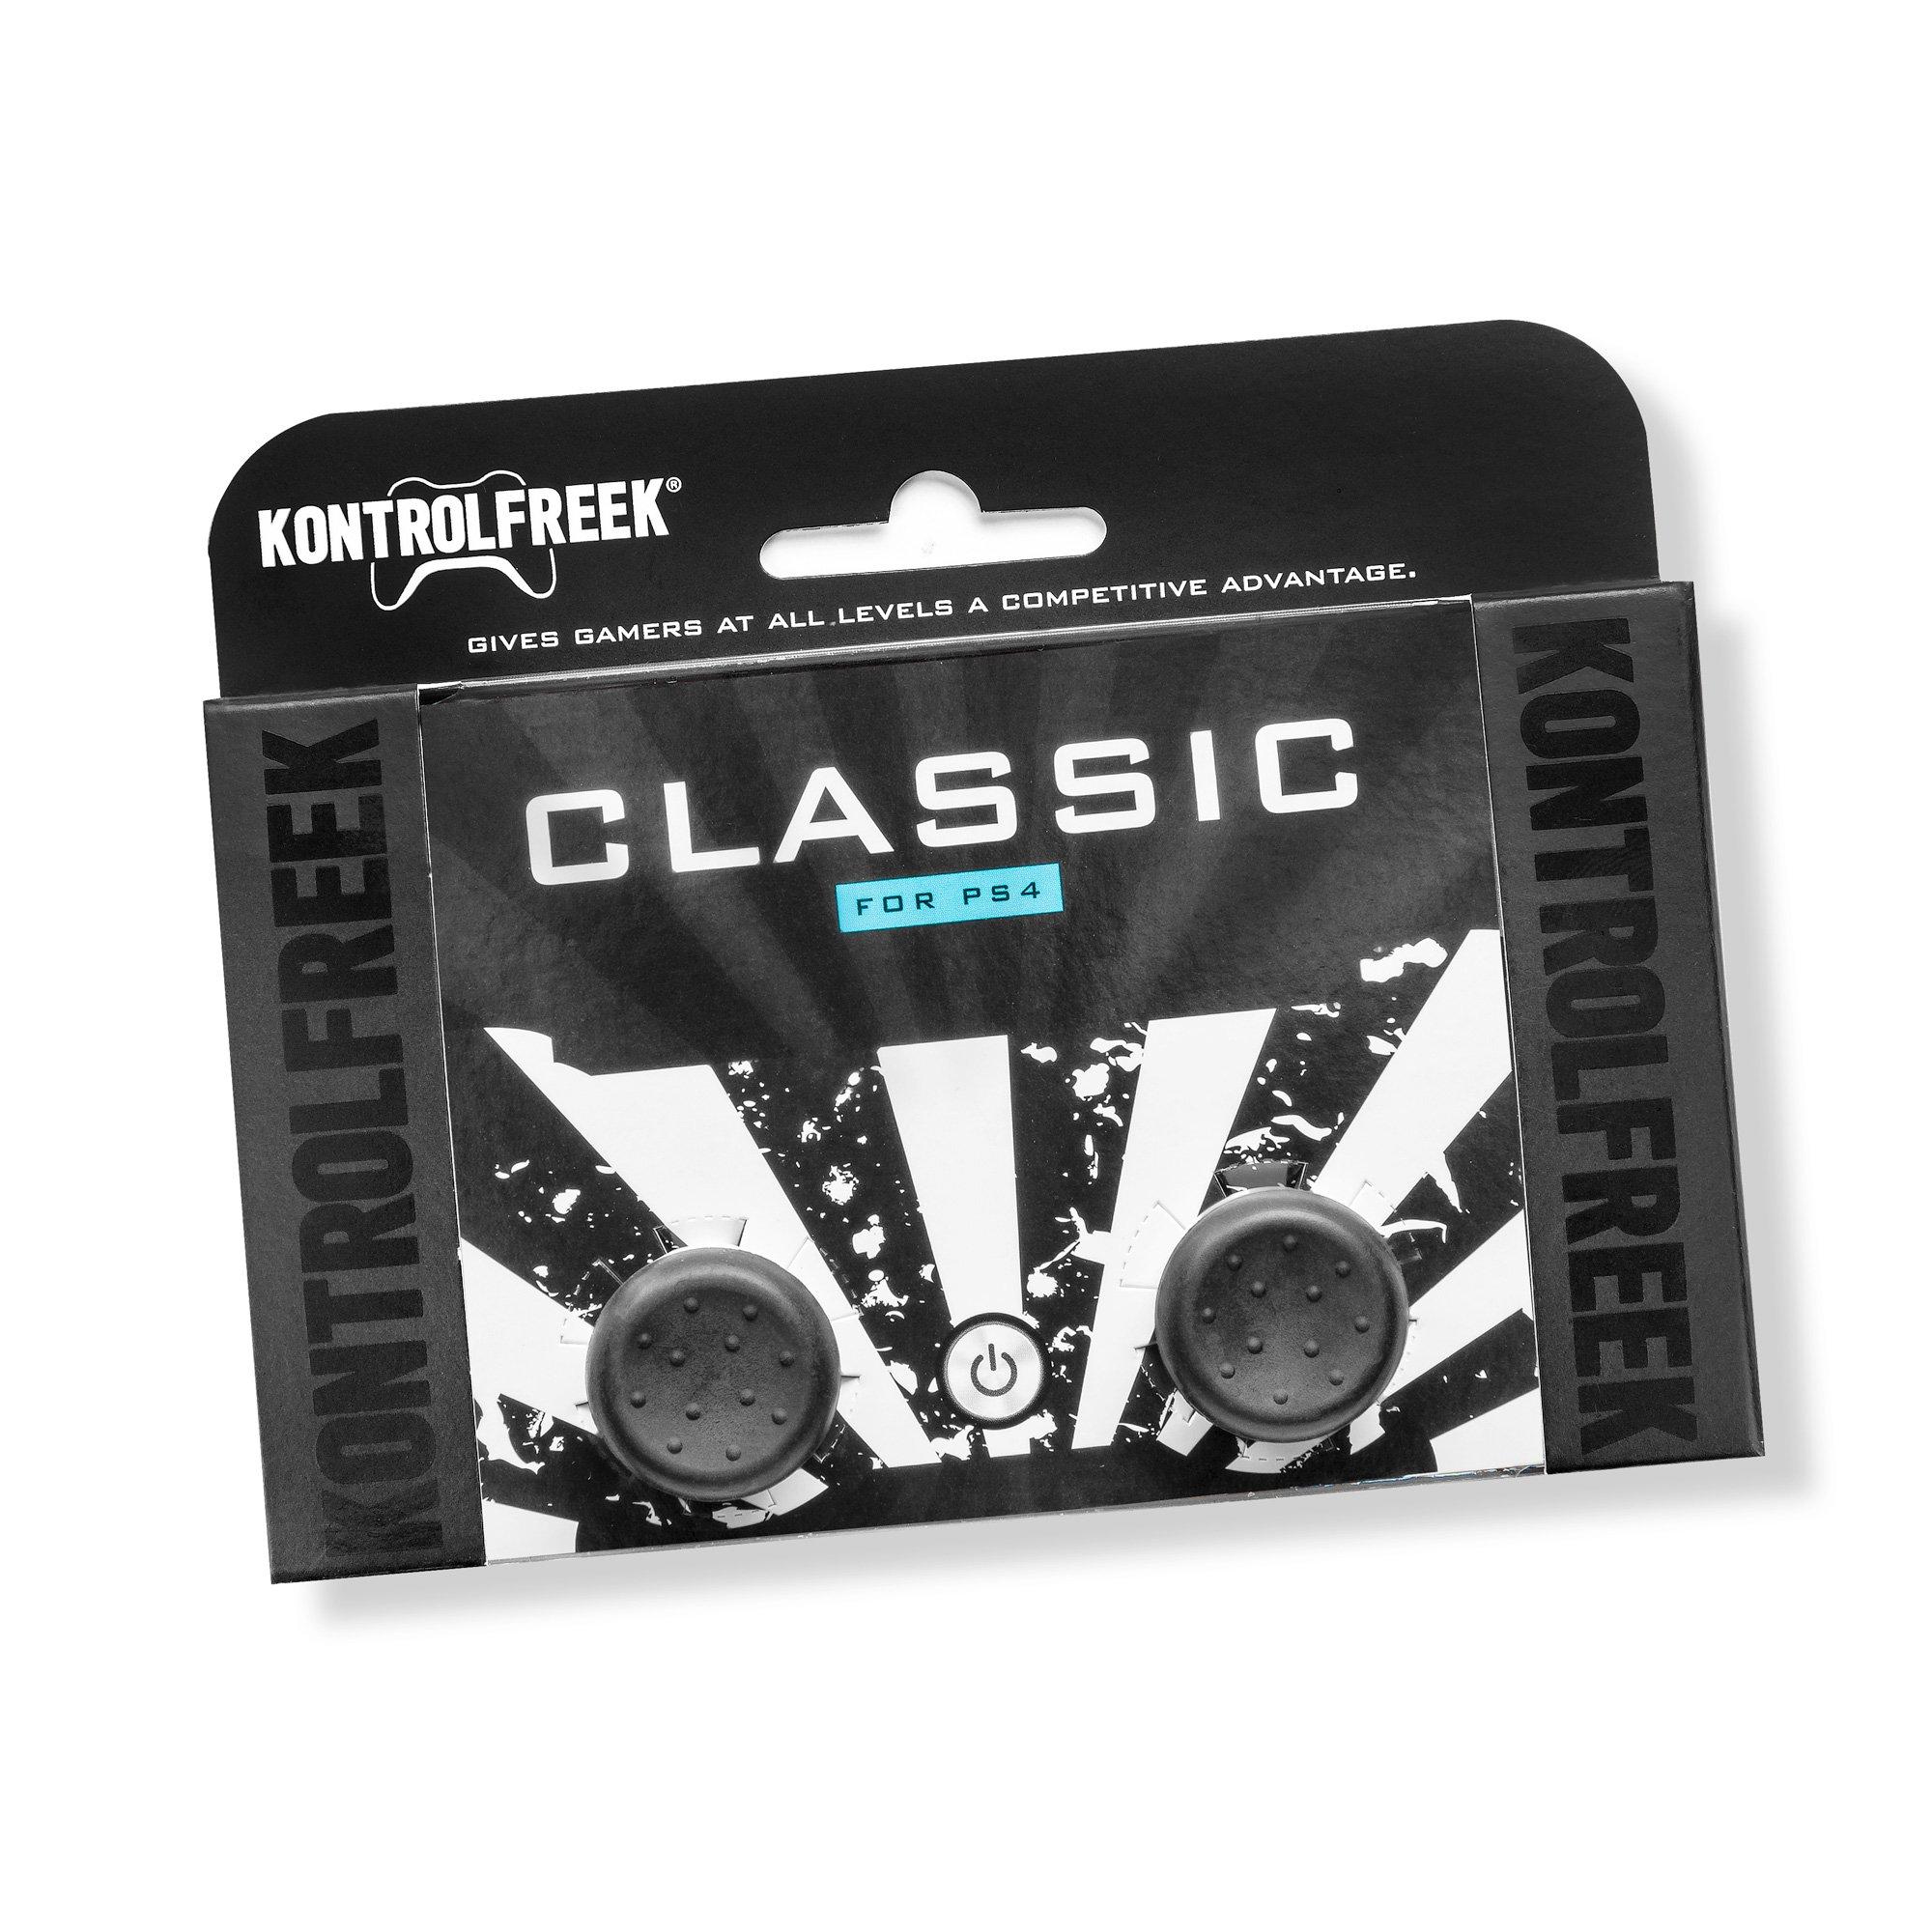 KontrolFreek Classic PS4